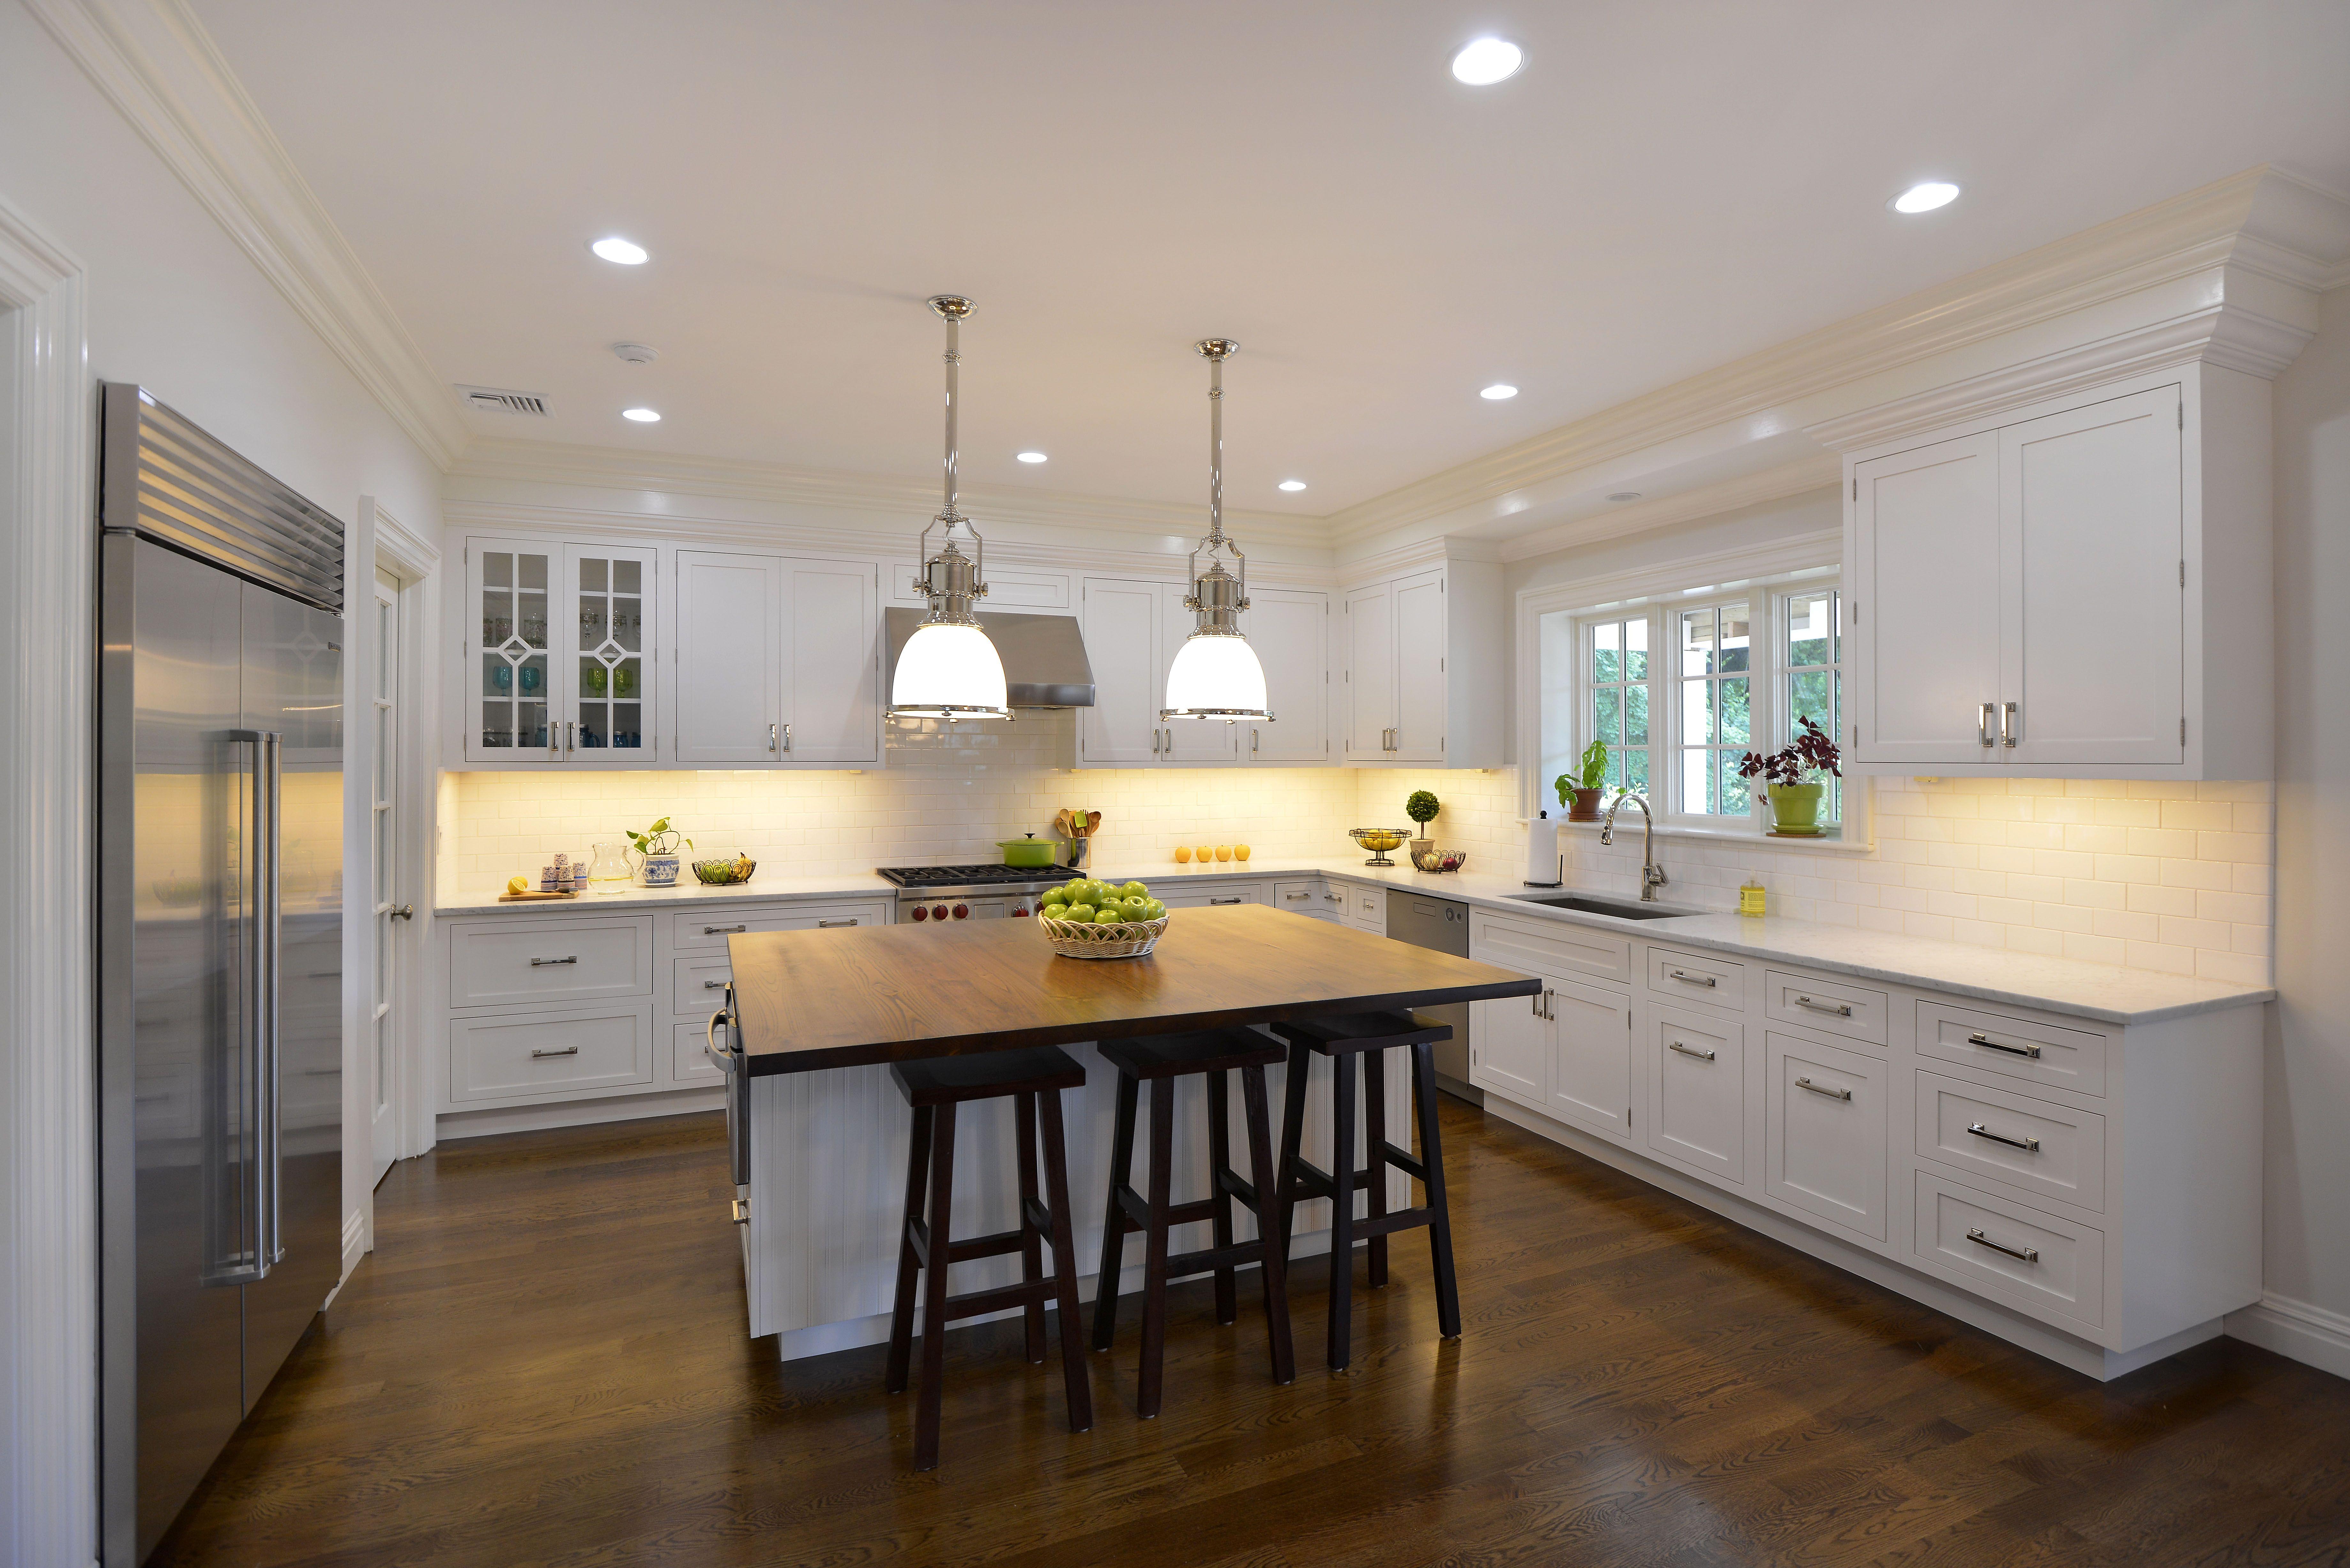 Majestic Kitchens and Bath designer Roberto Leira created a ...